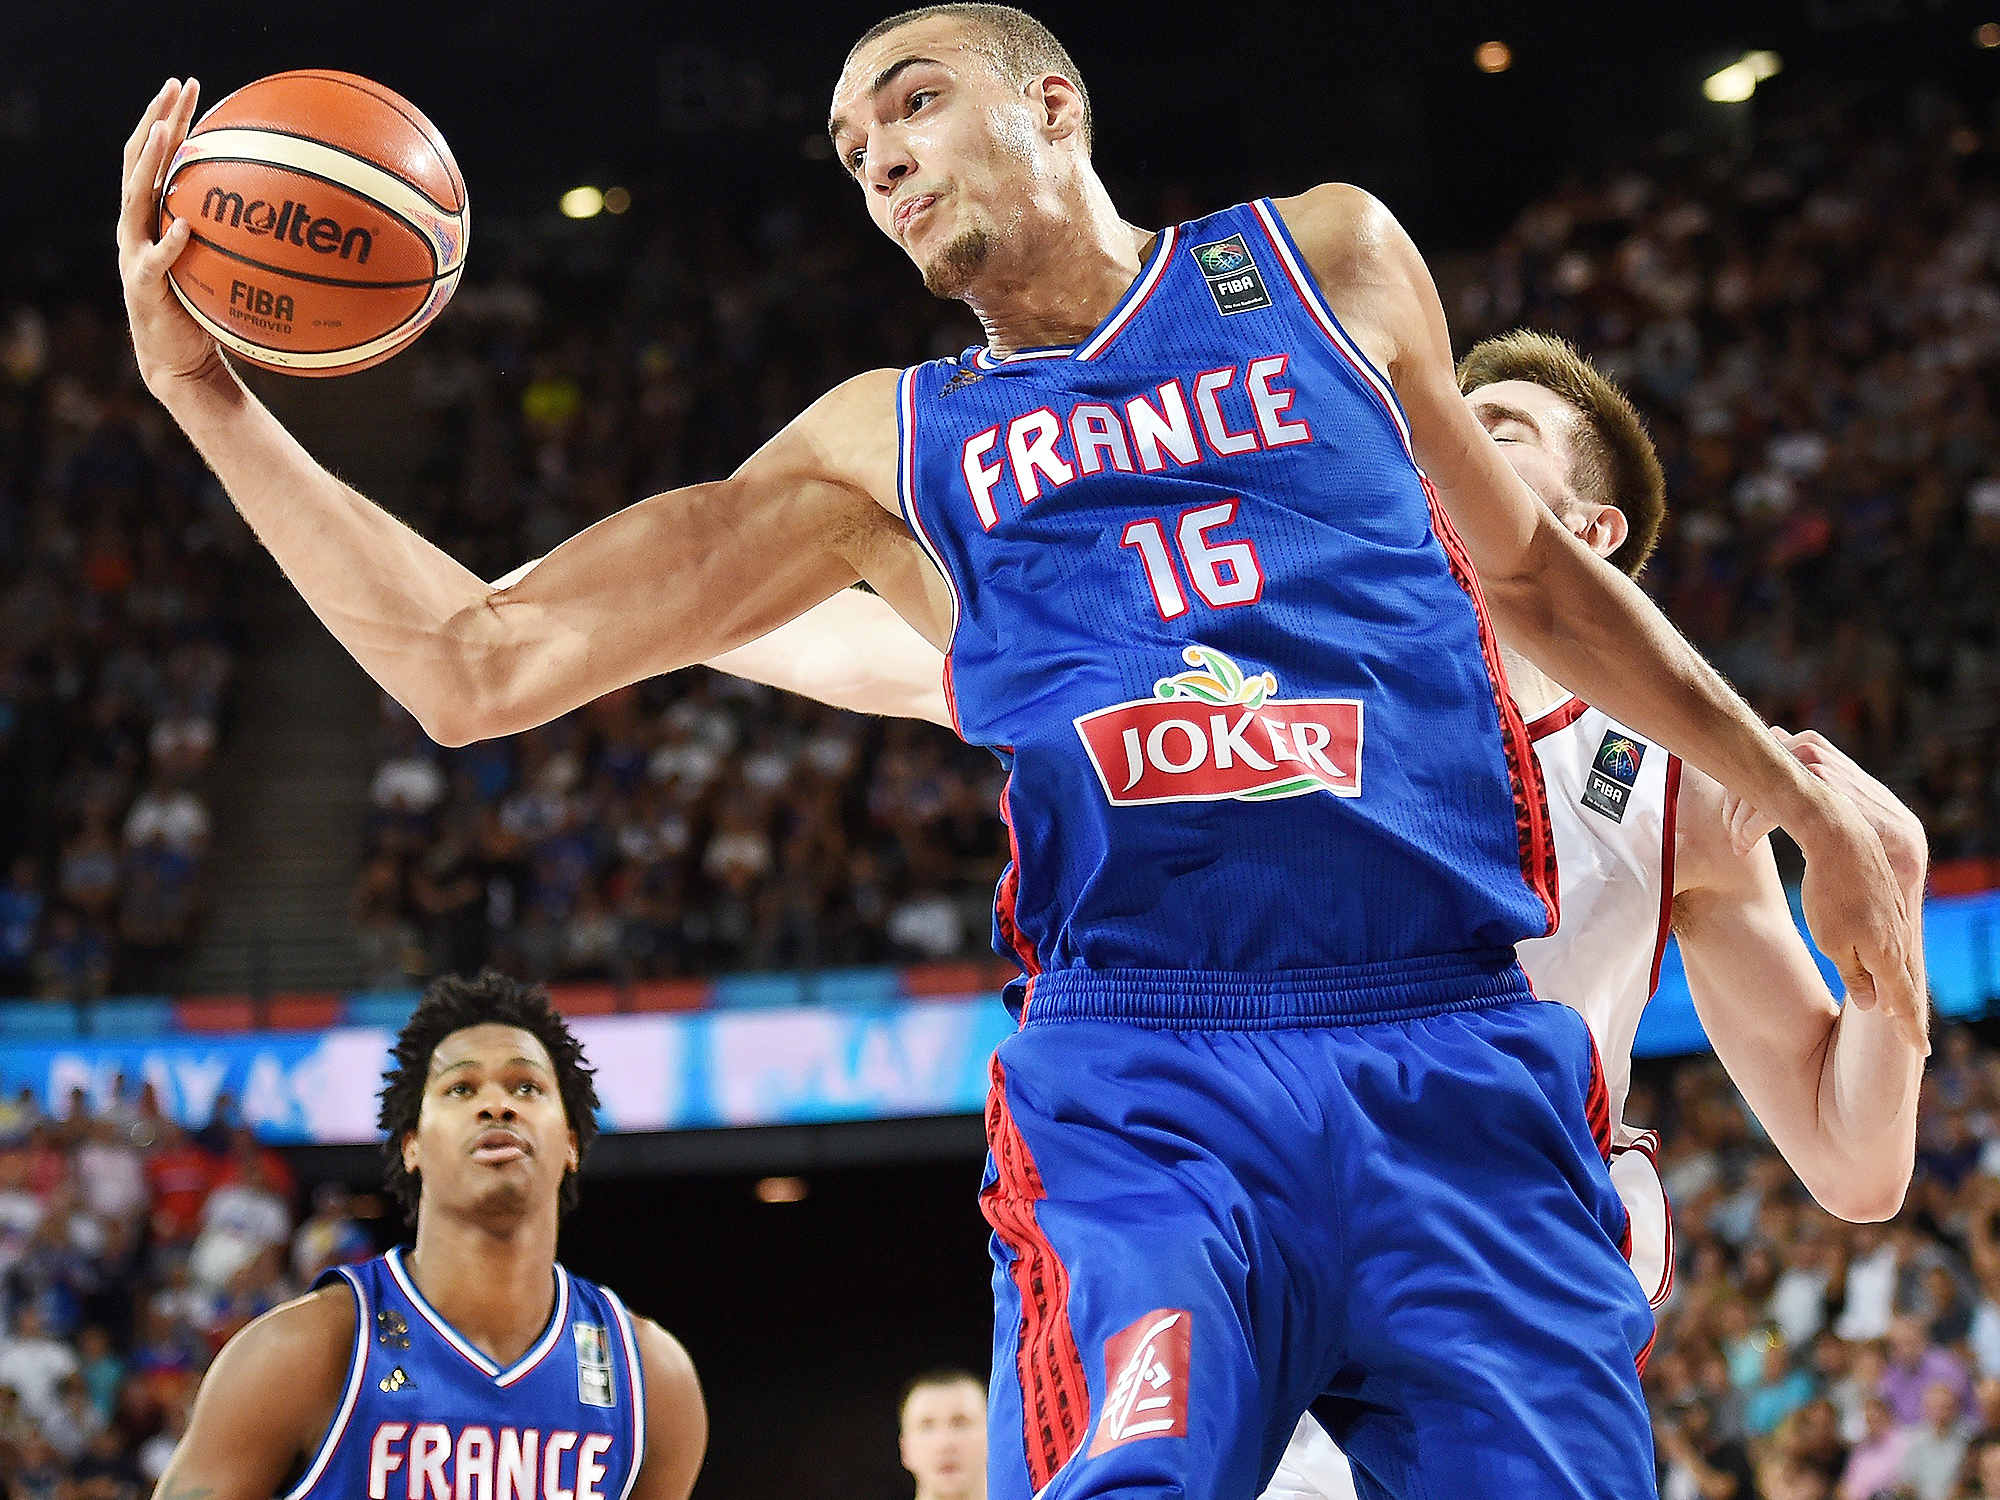 2016-rio-olympics-mens-basketball-rudy-gobert-france